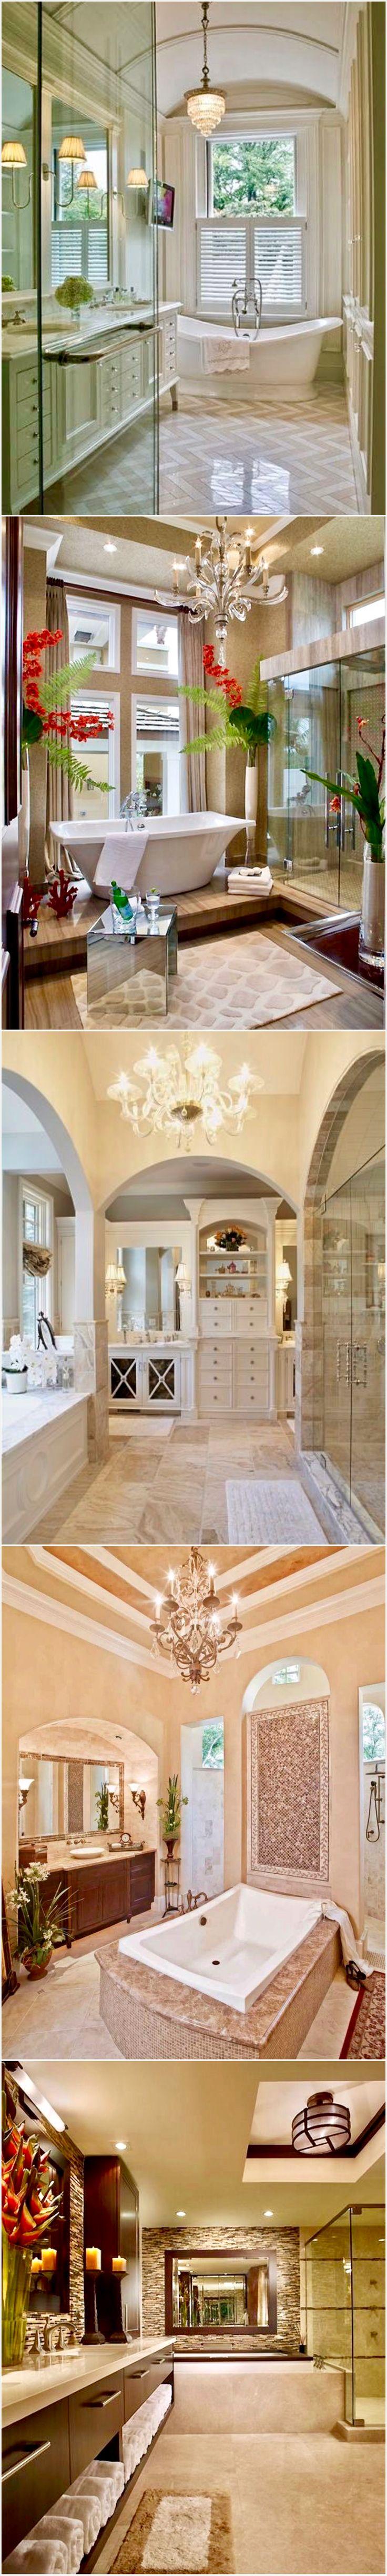 1358 best master bath images on pinterest dream bathrooms 25 stunning bathroom designs